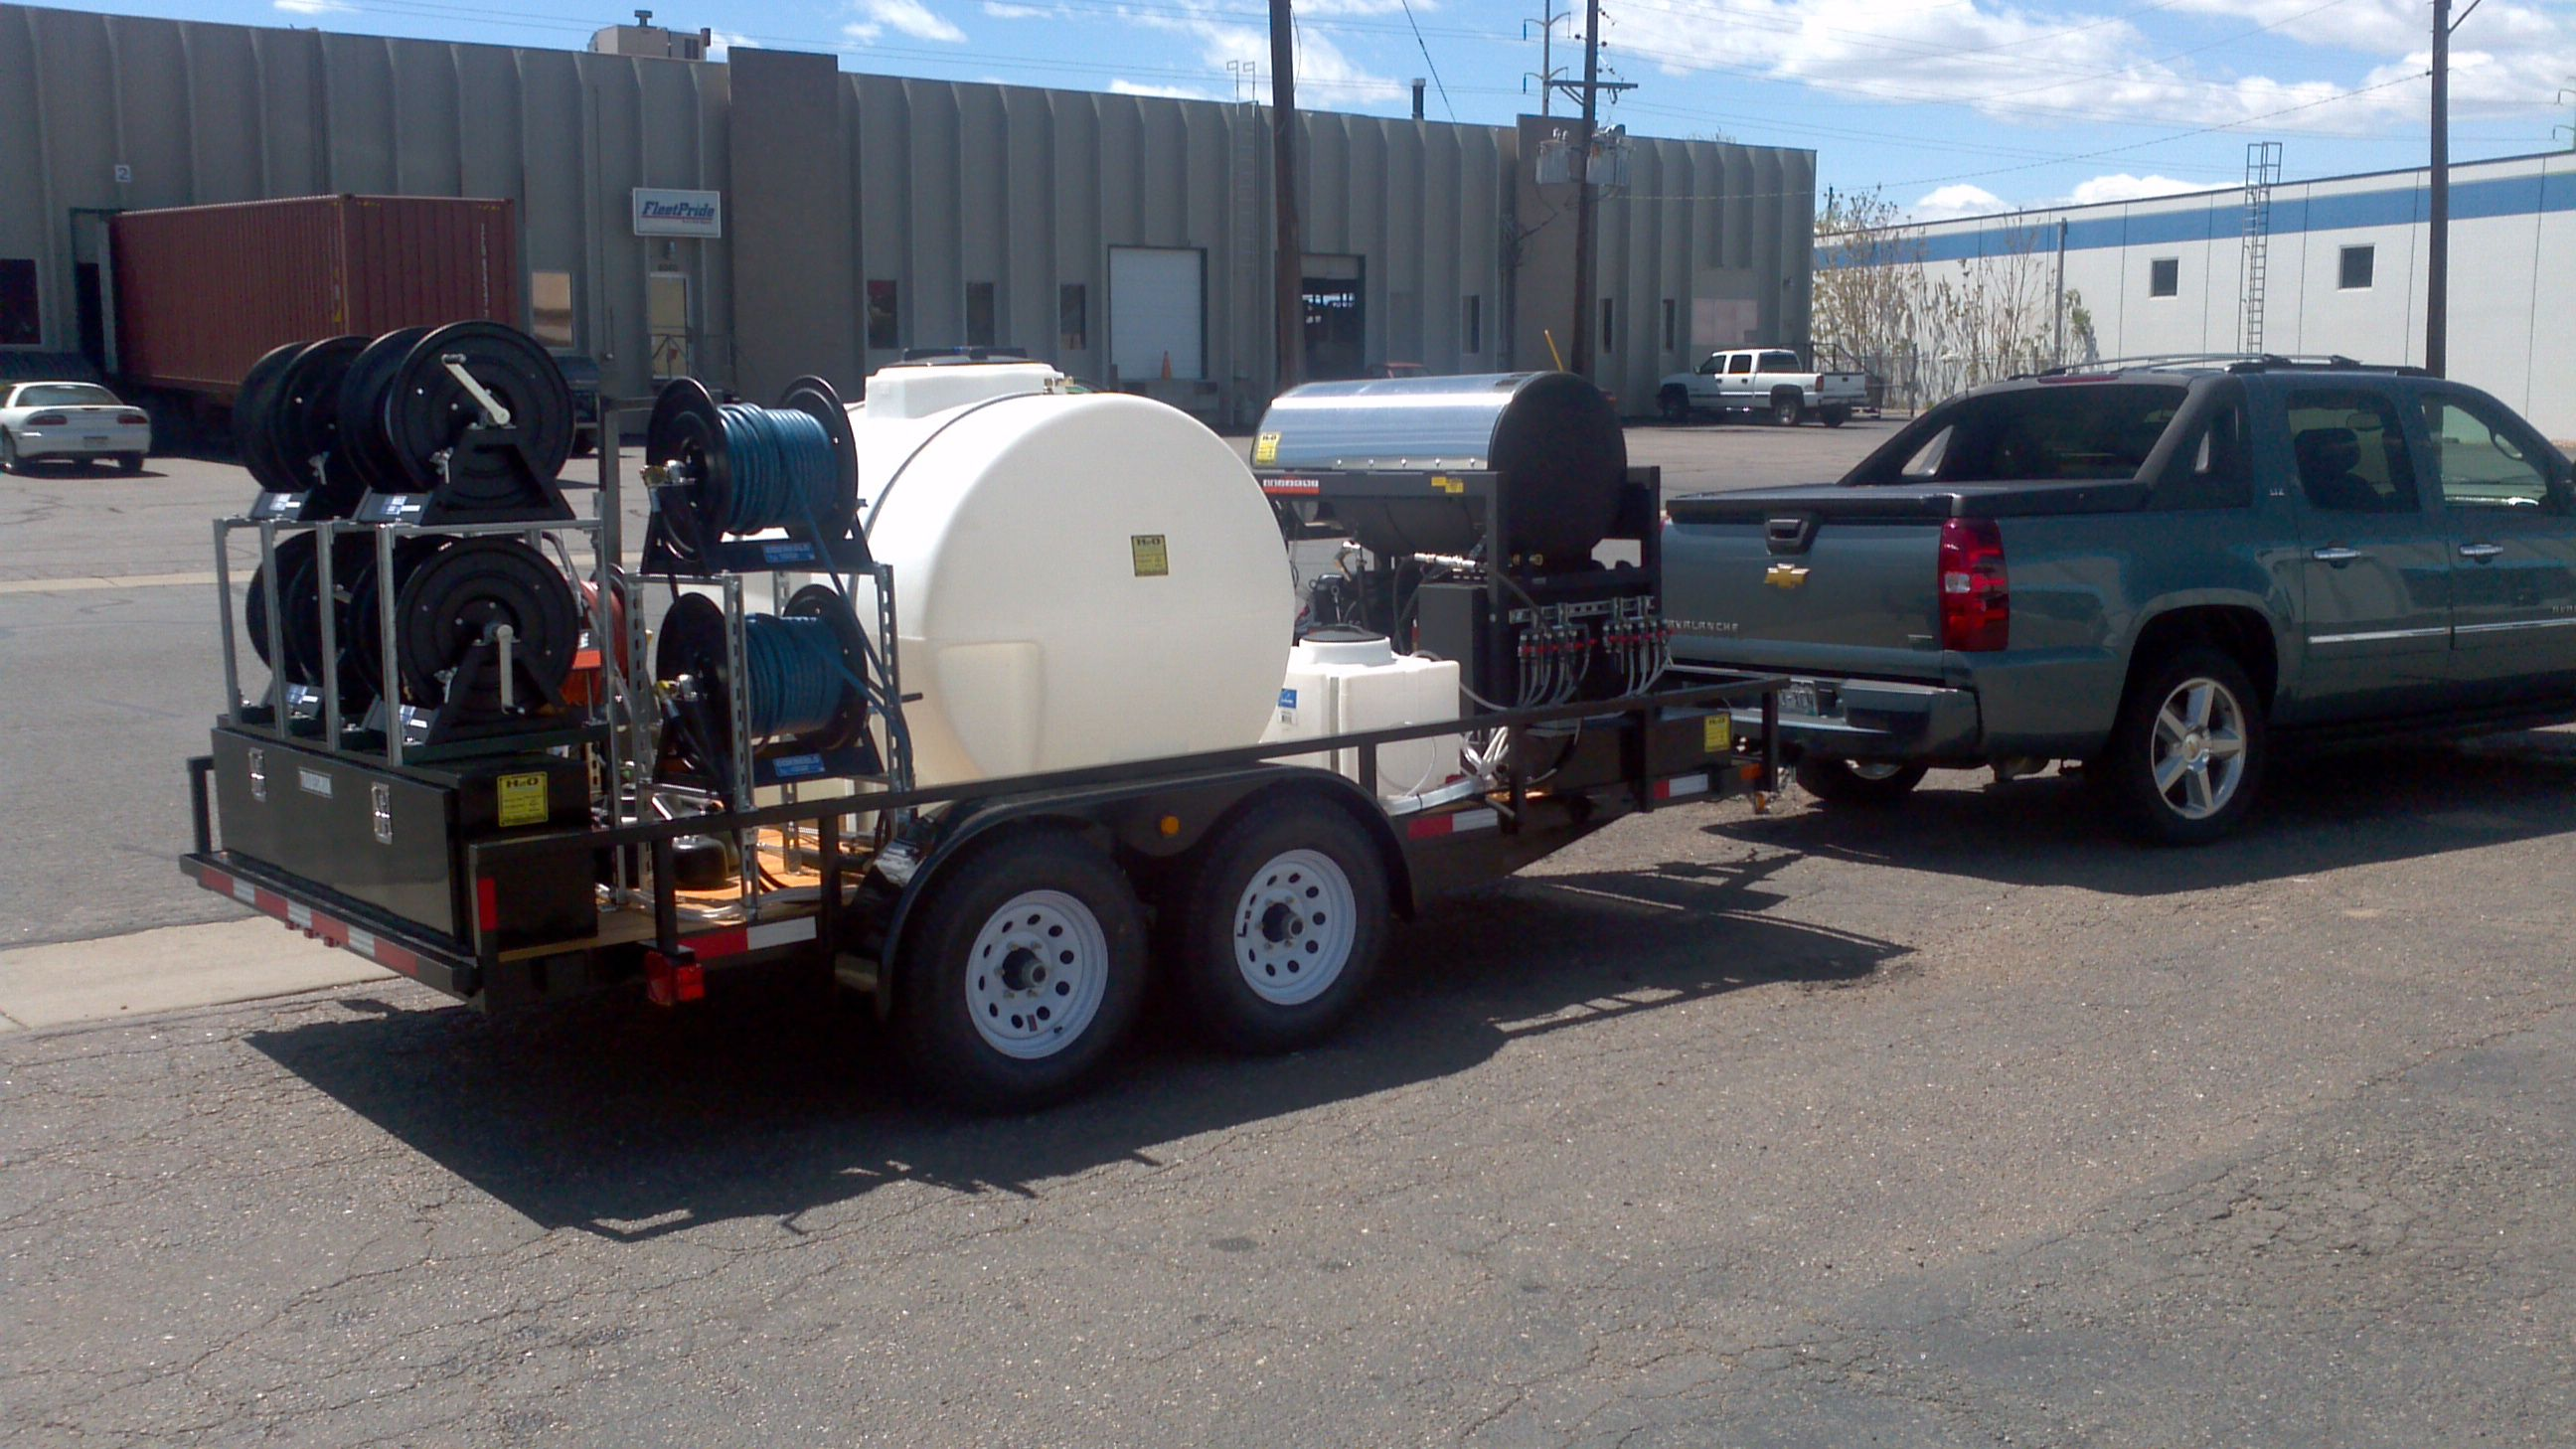 Pressure Washer Trailer Unit Hot Water Pressure Washer Pressure Washing Business Car Wash Business Custom Trailers